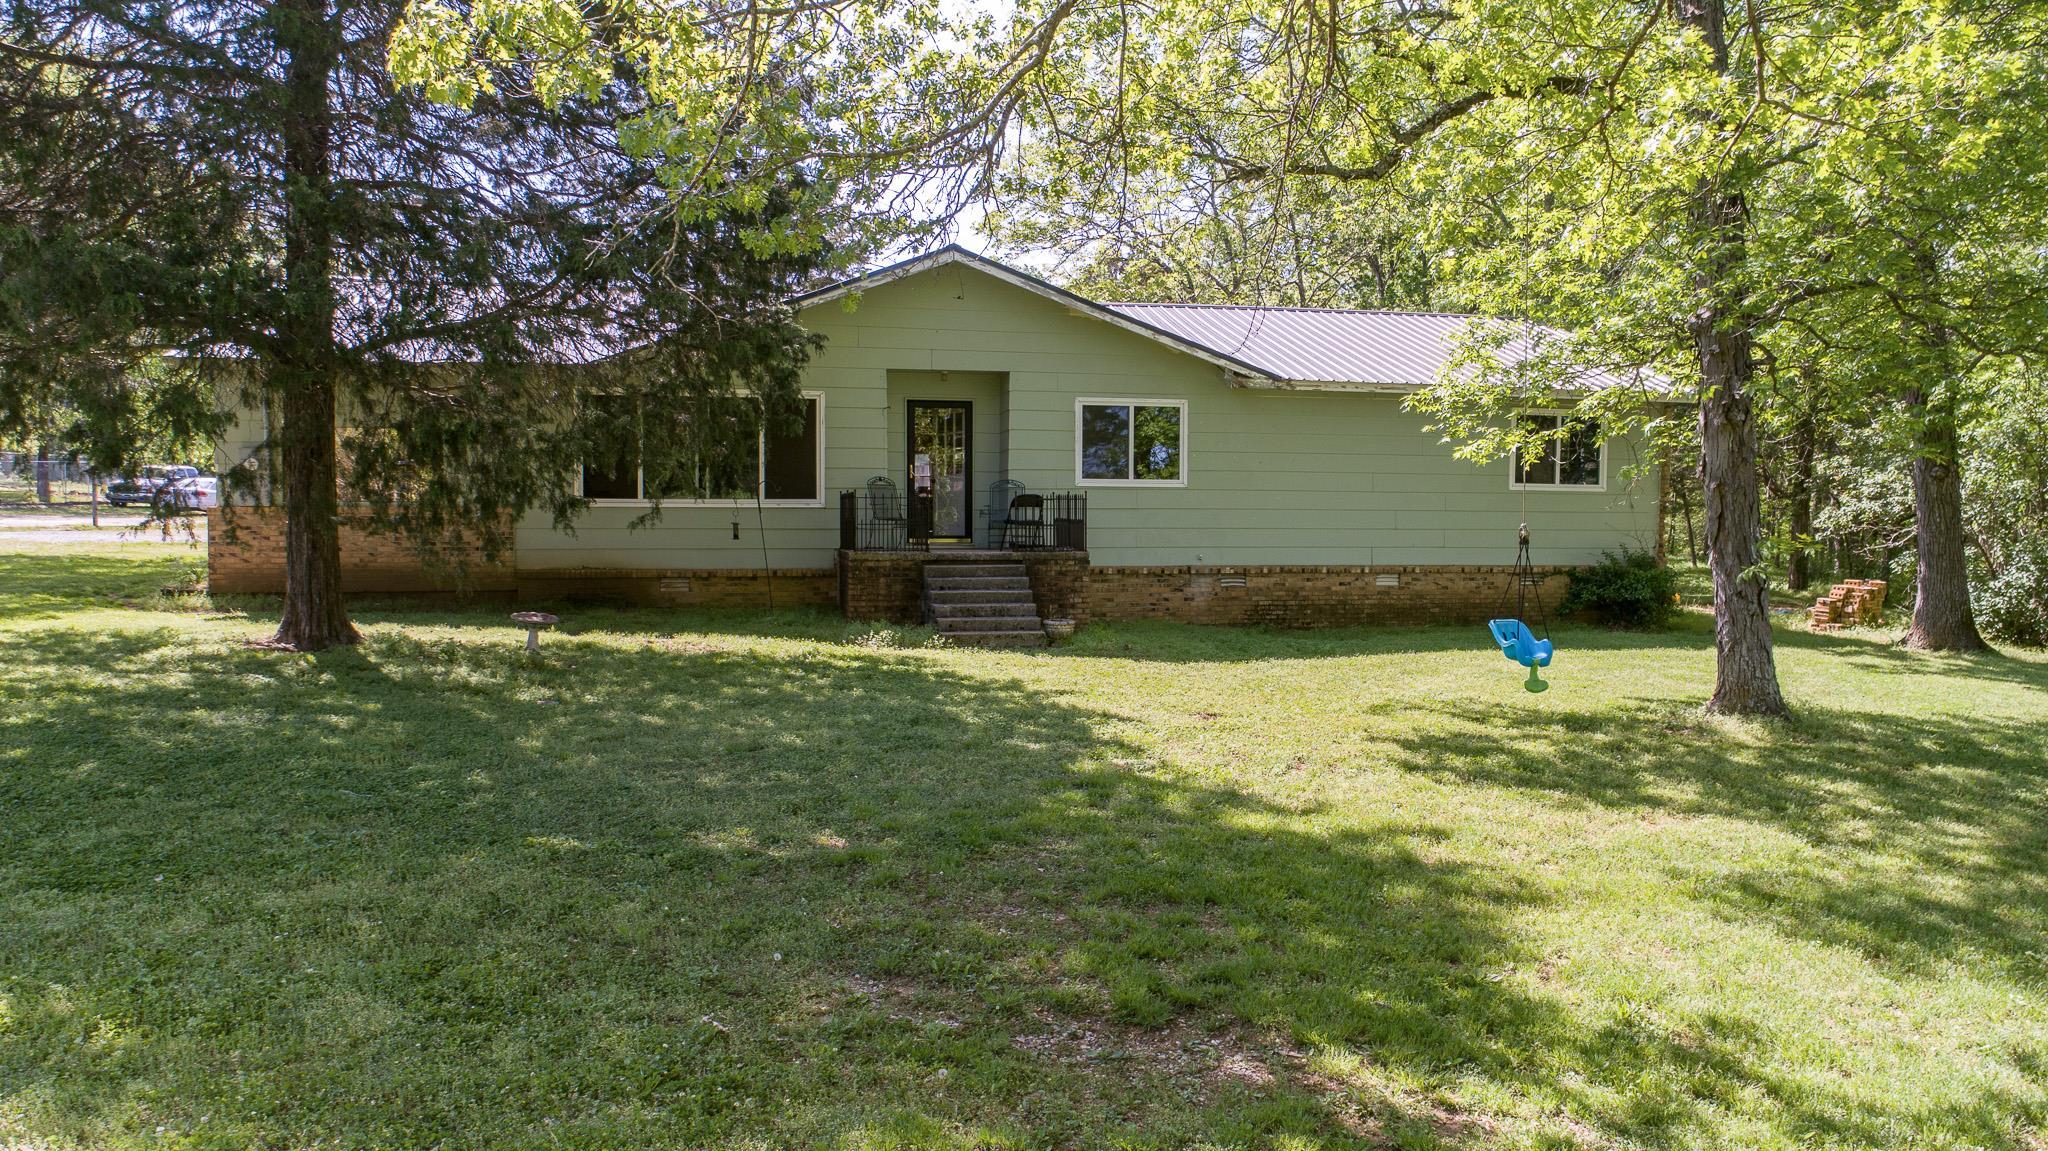 0 W Bill France Blvd, Murfreesboro, TN 37129 - Murfreesboro, TN real estate listing